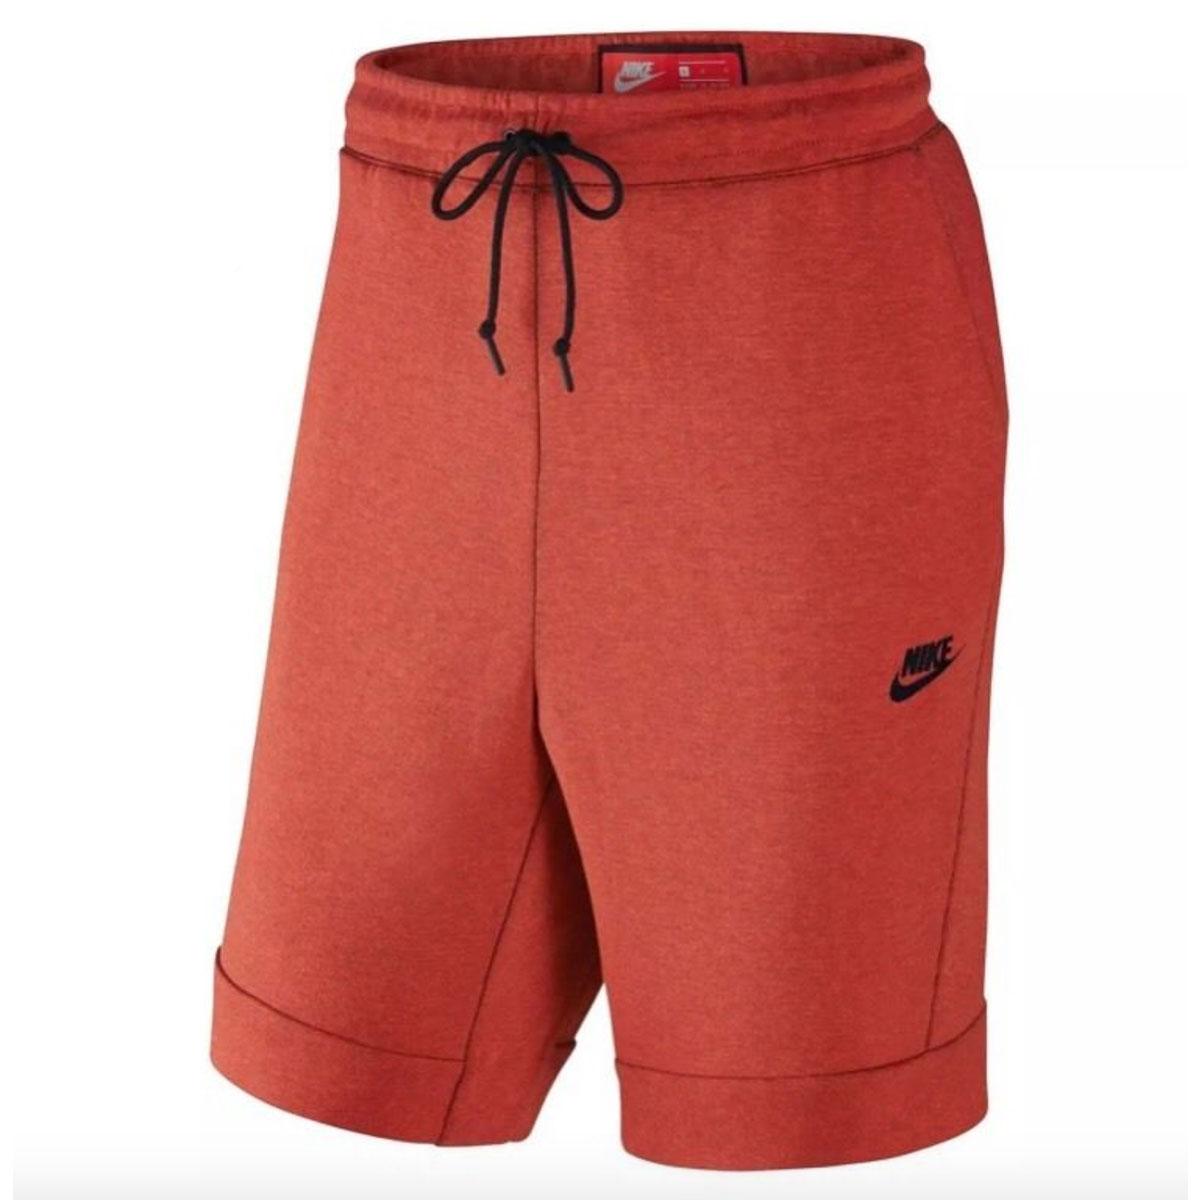 48e450f44351 Nike Tech Fleece Short Junior ROOD online kopen bij Sportpaleis.